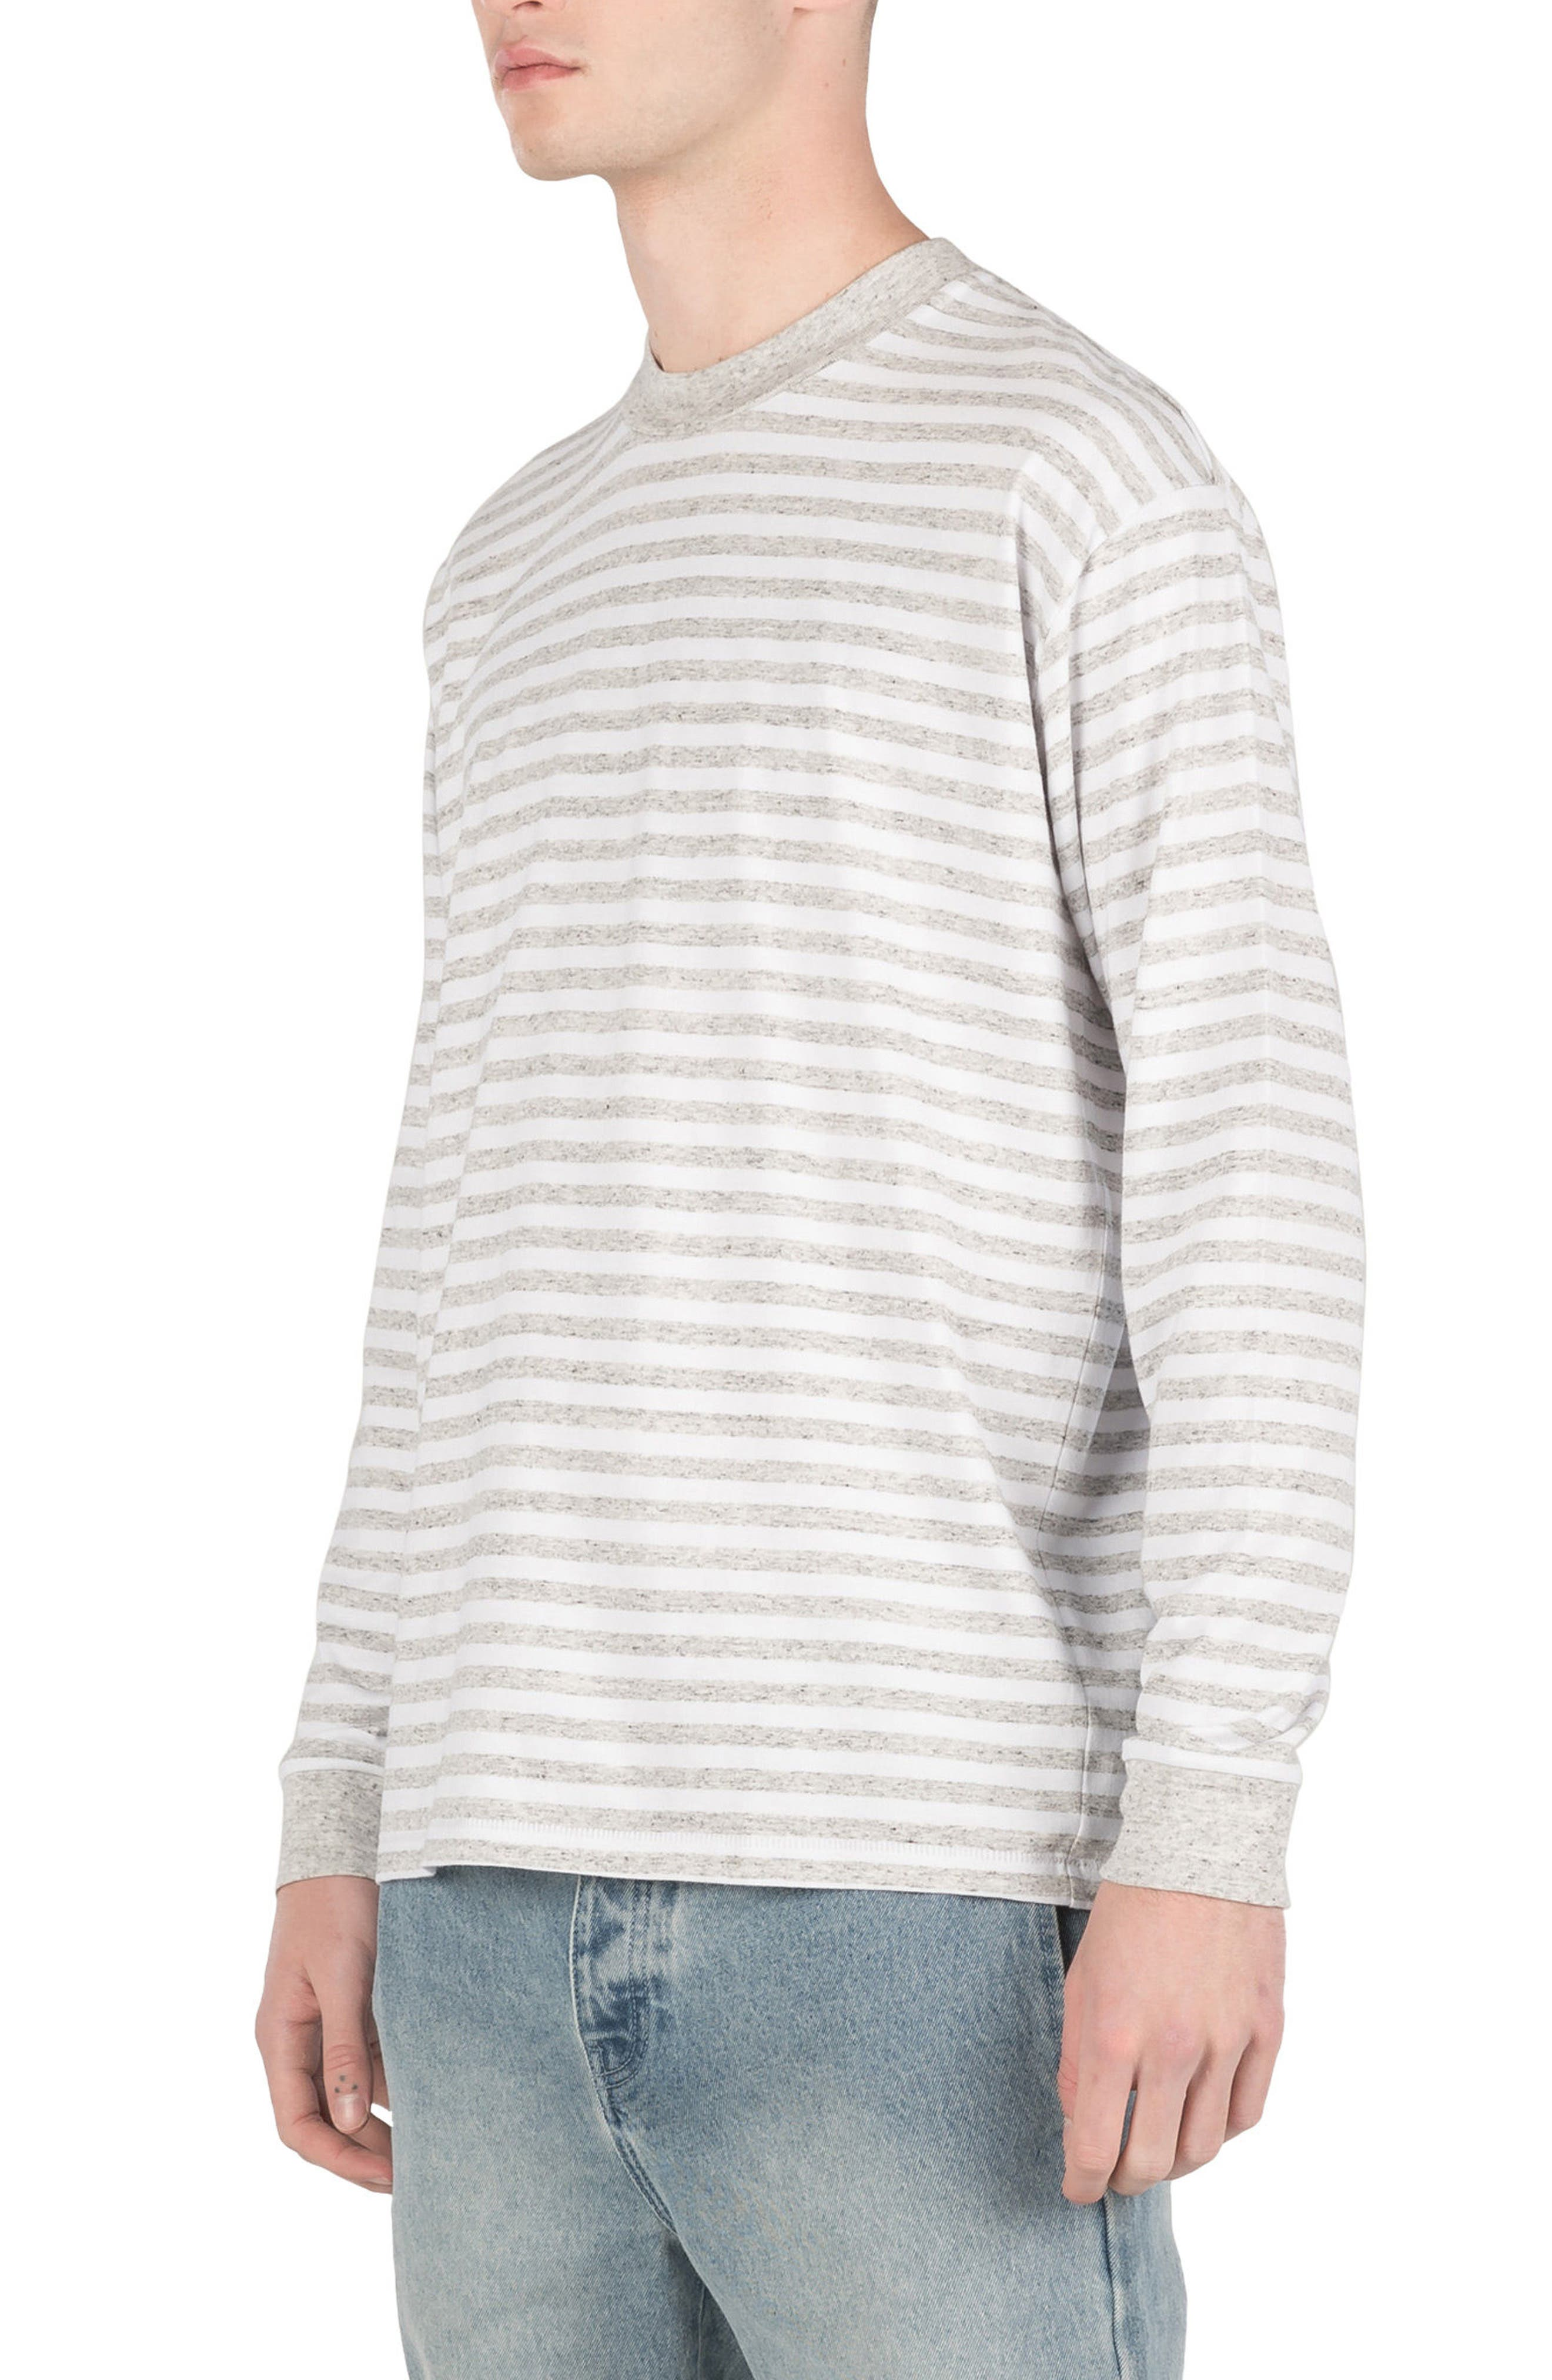 Box Long Sleeve T-Shirt,                             Alternate thumbnail 4, color,                             White/ Storm Marle